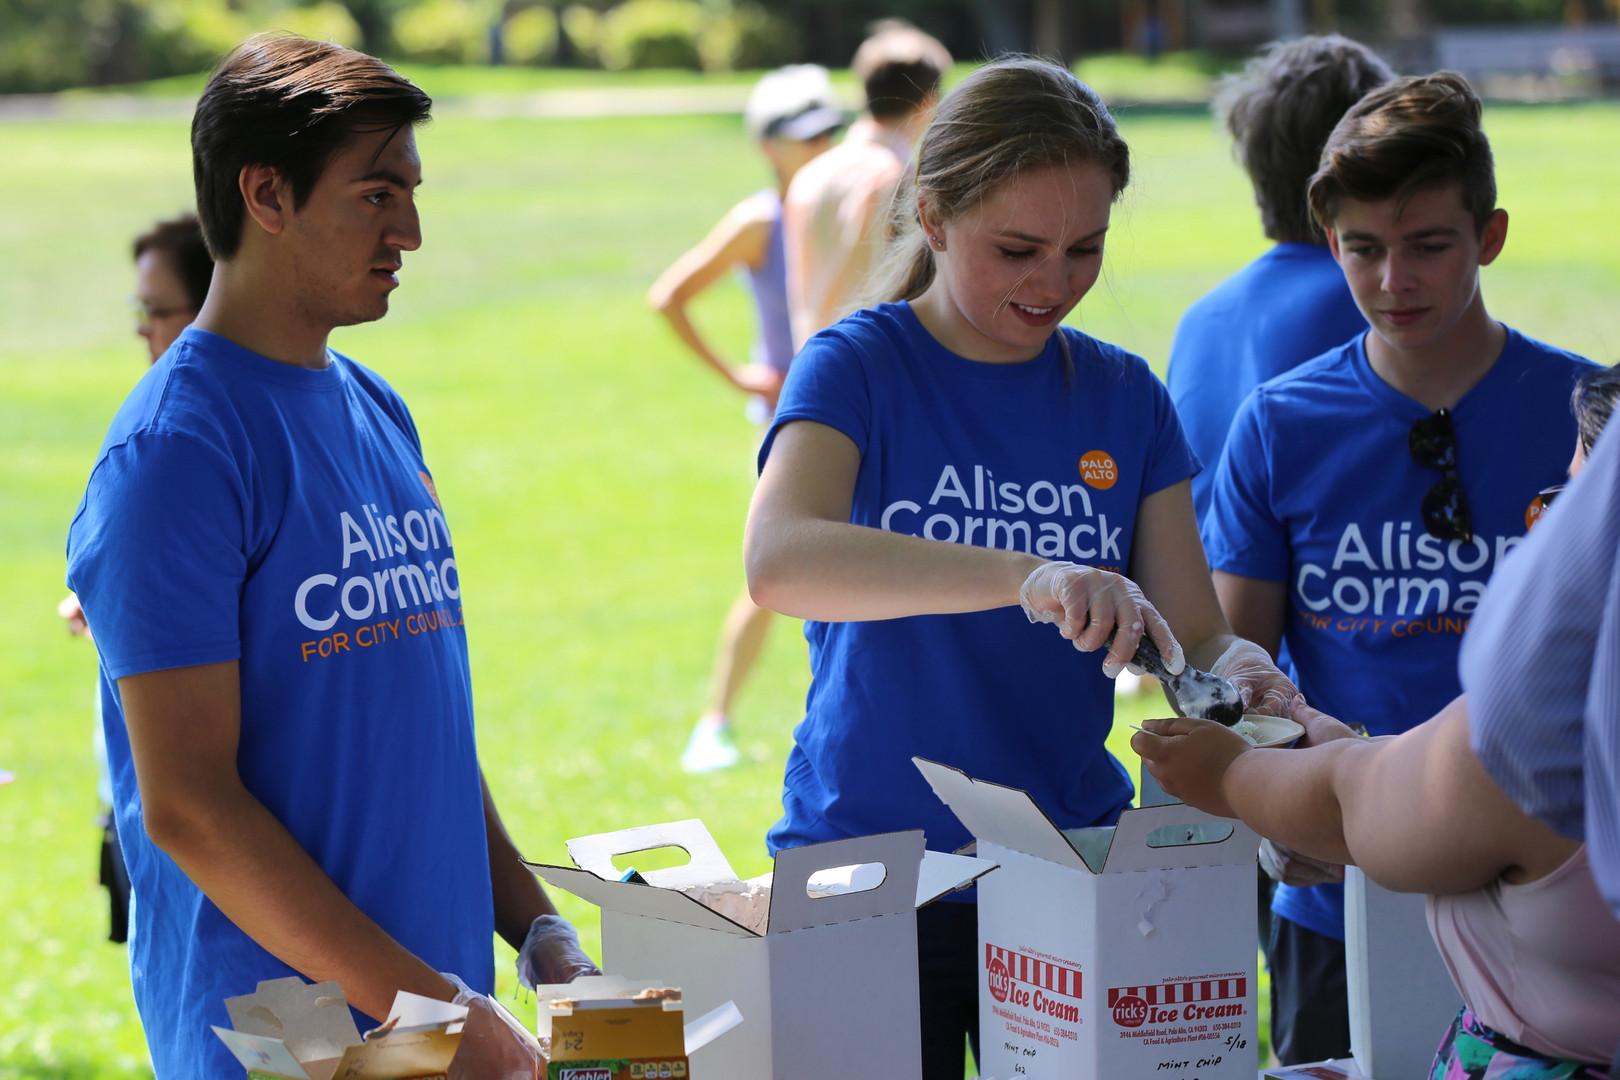 Teen Interns scoop ice cream from Rick's in Palo Alto